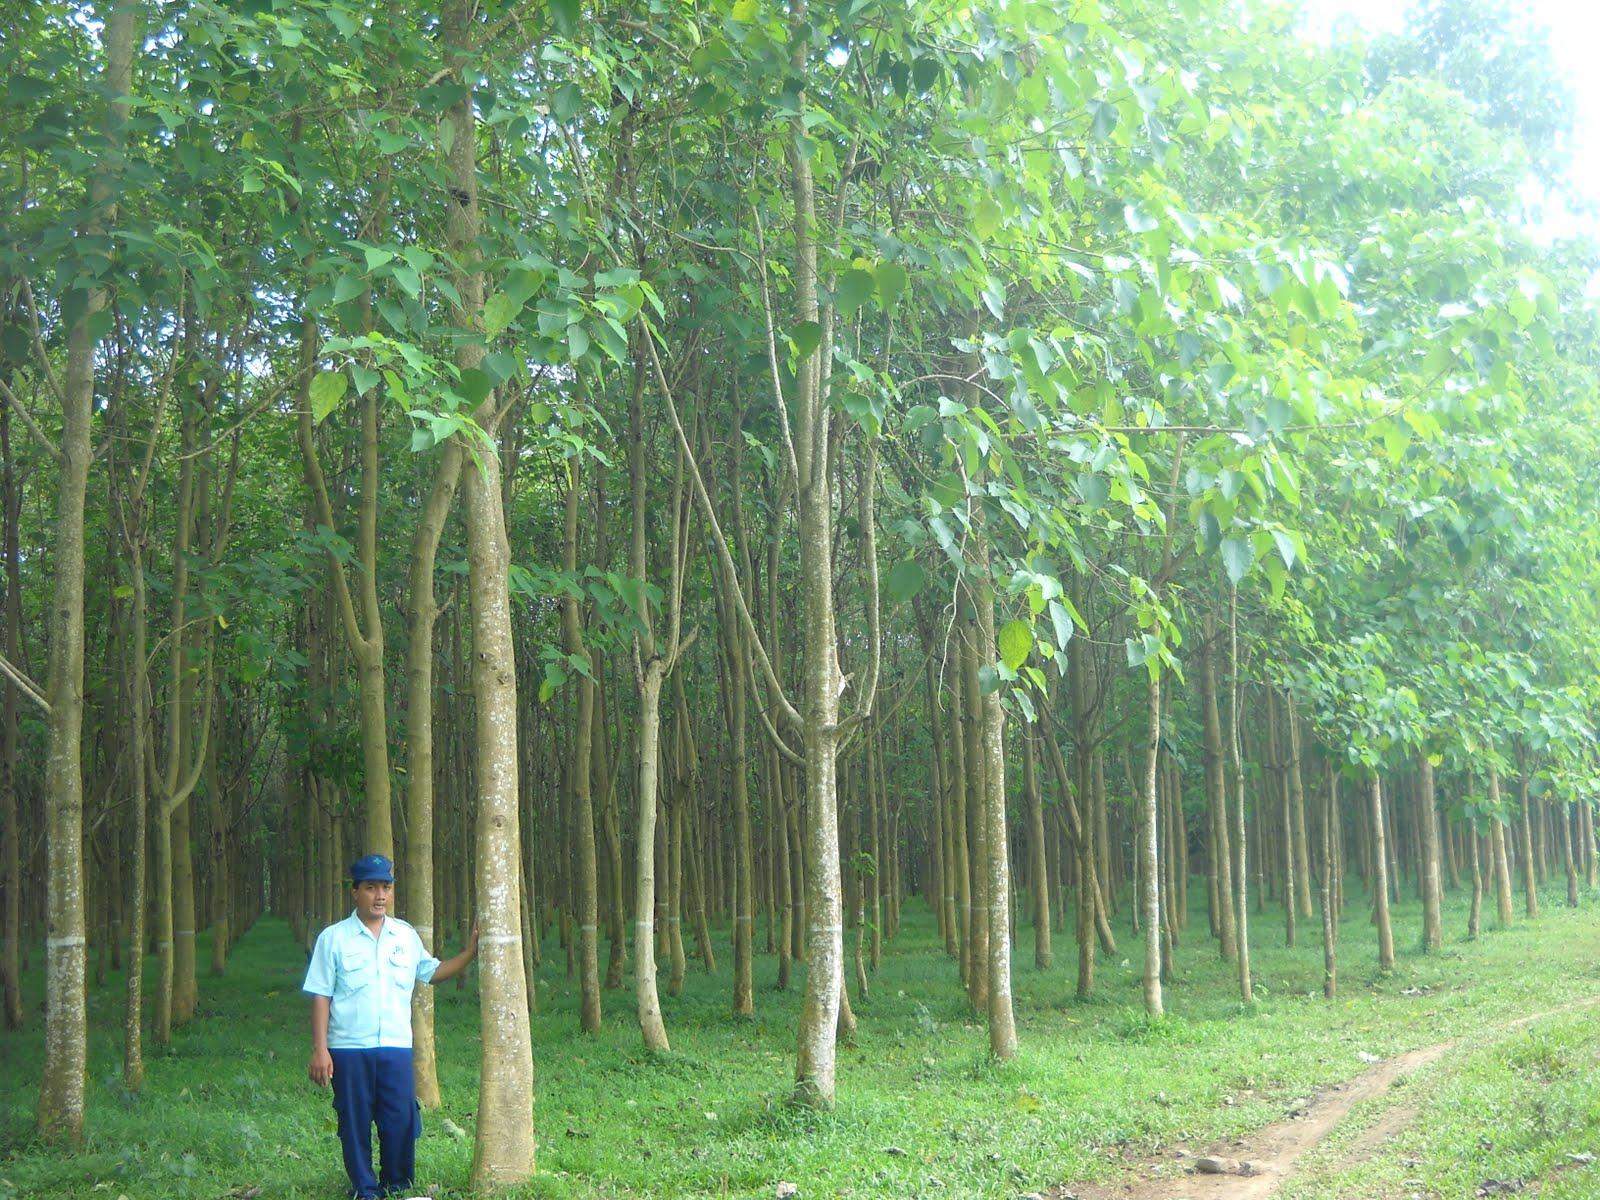 TEKNIK BUDIDAYA JATI PUTIH (Gmelina arborea Roxb)